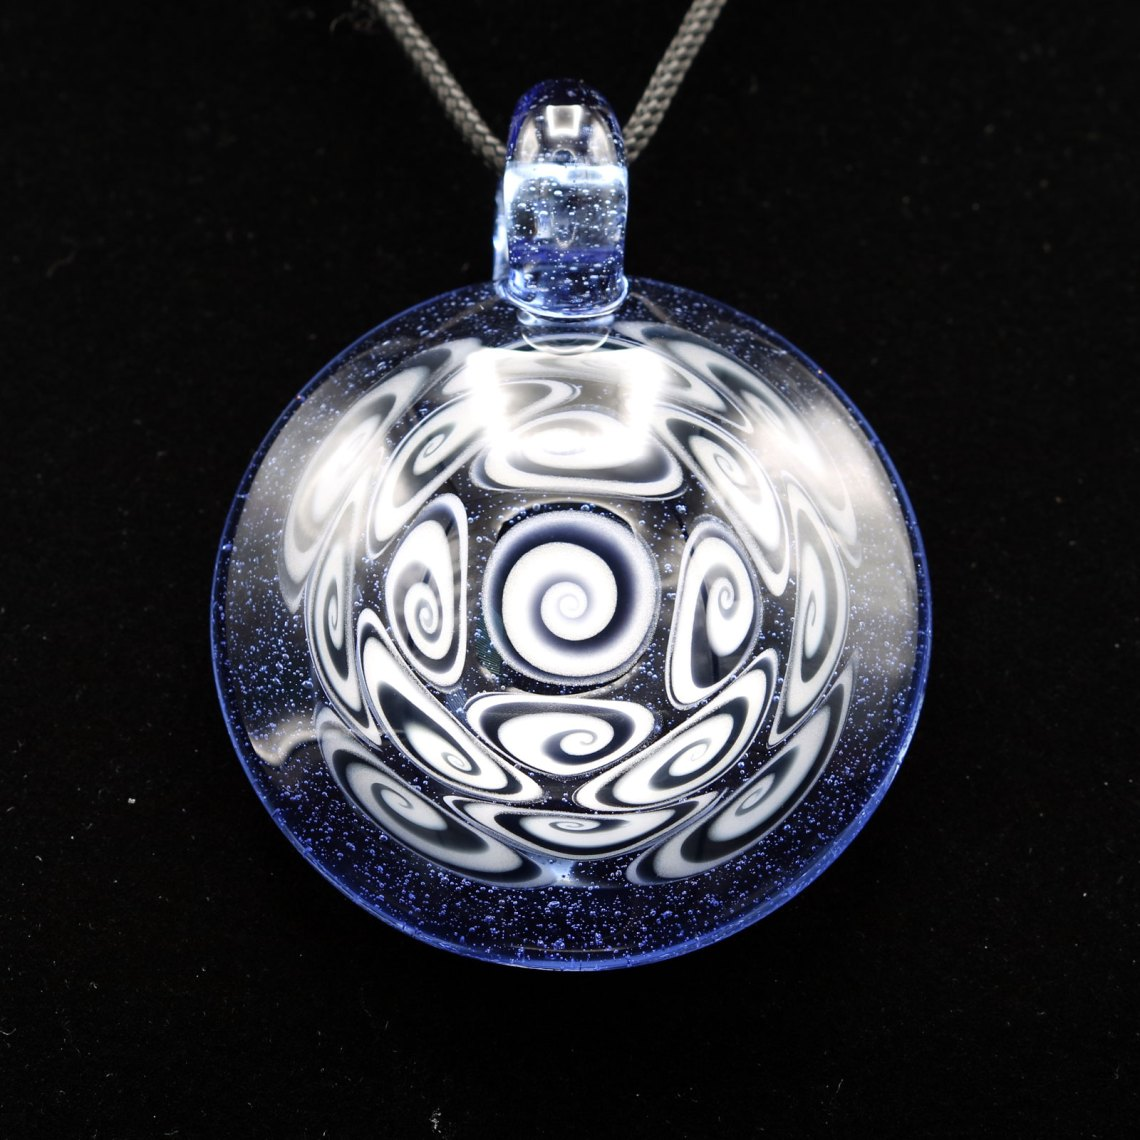 Kaja Glass – 17 Section XXL Bluemingo Microspiral Glass Pendant